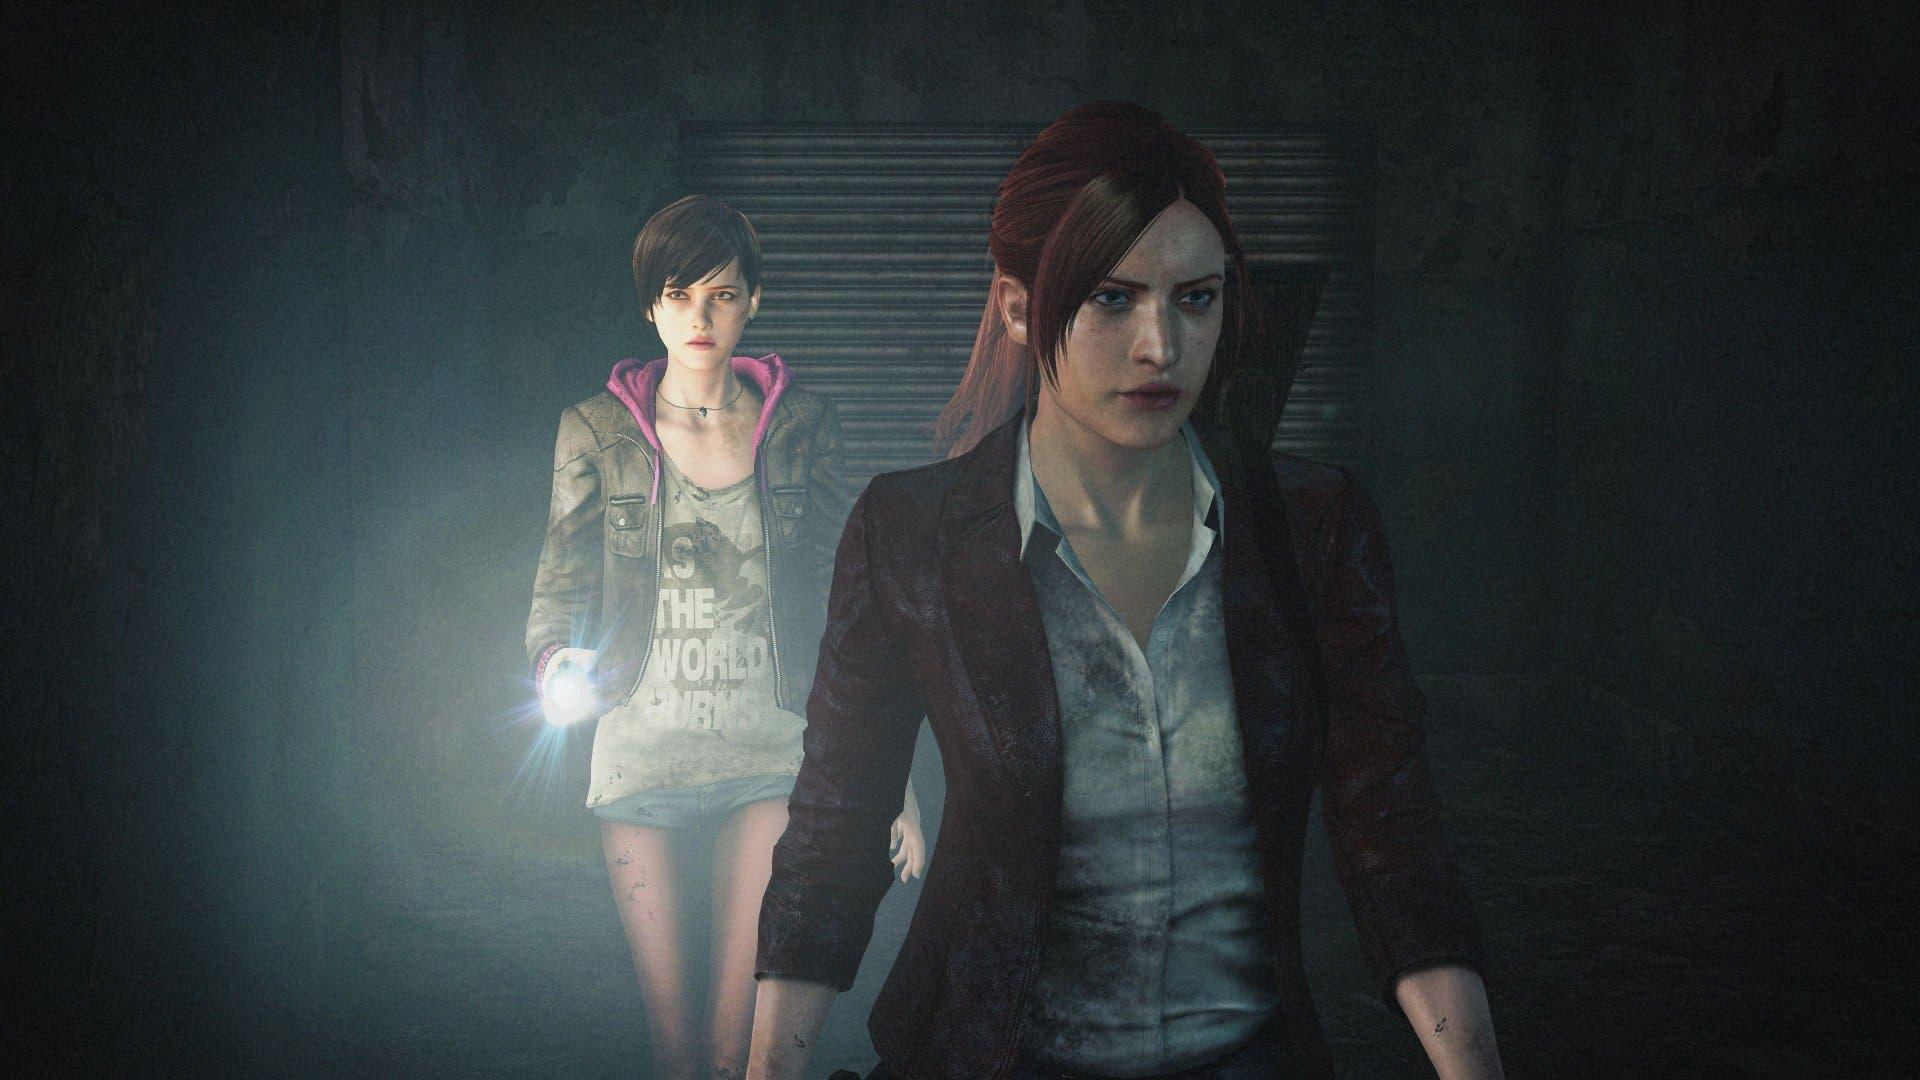 El primer episodio de Resident Evil Revelations 2, gratis en la Store de Xbox One 14